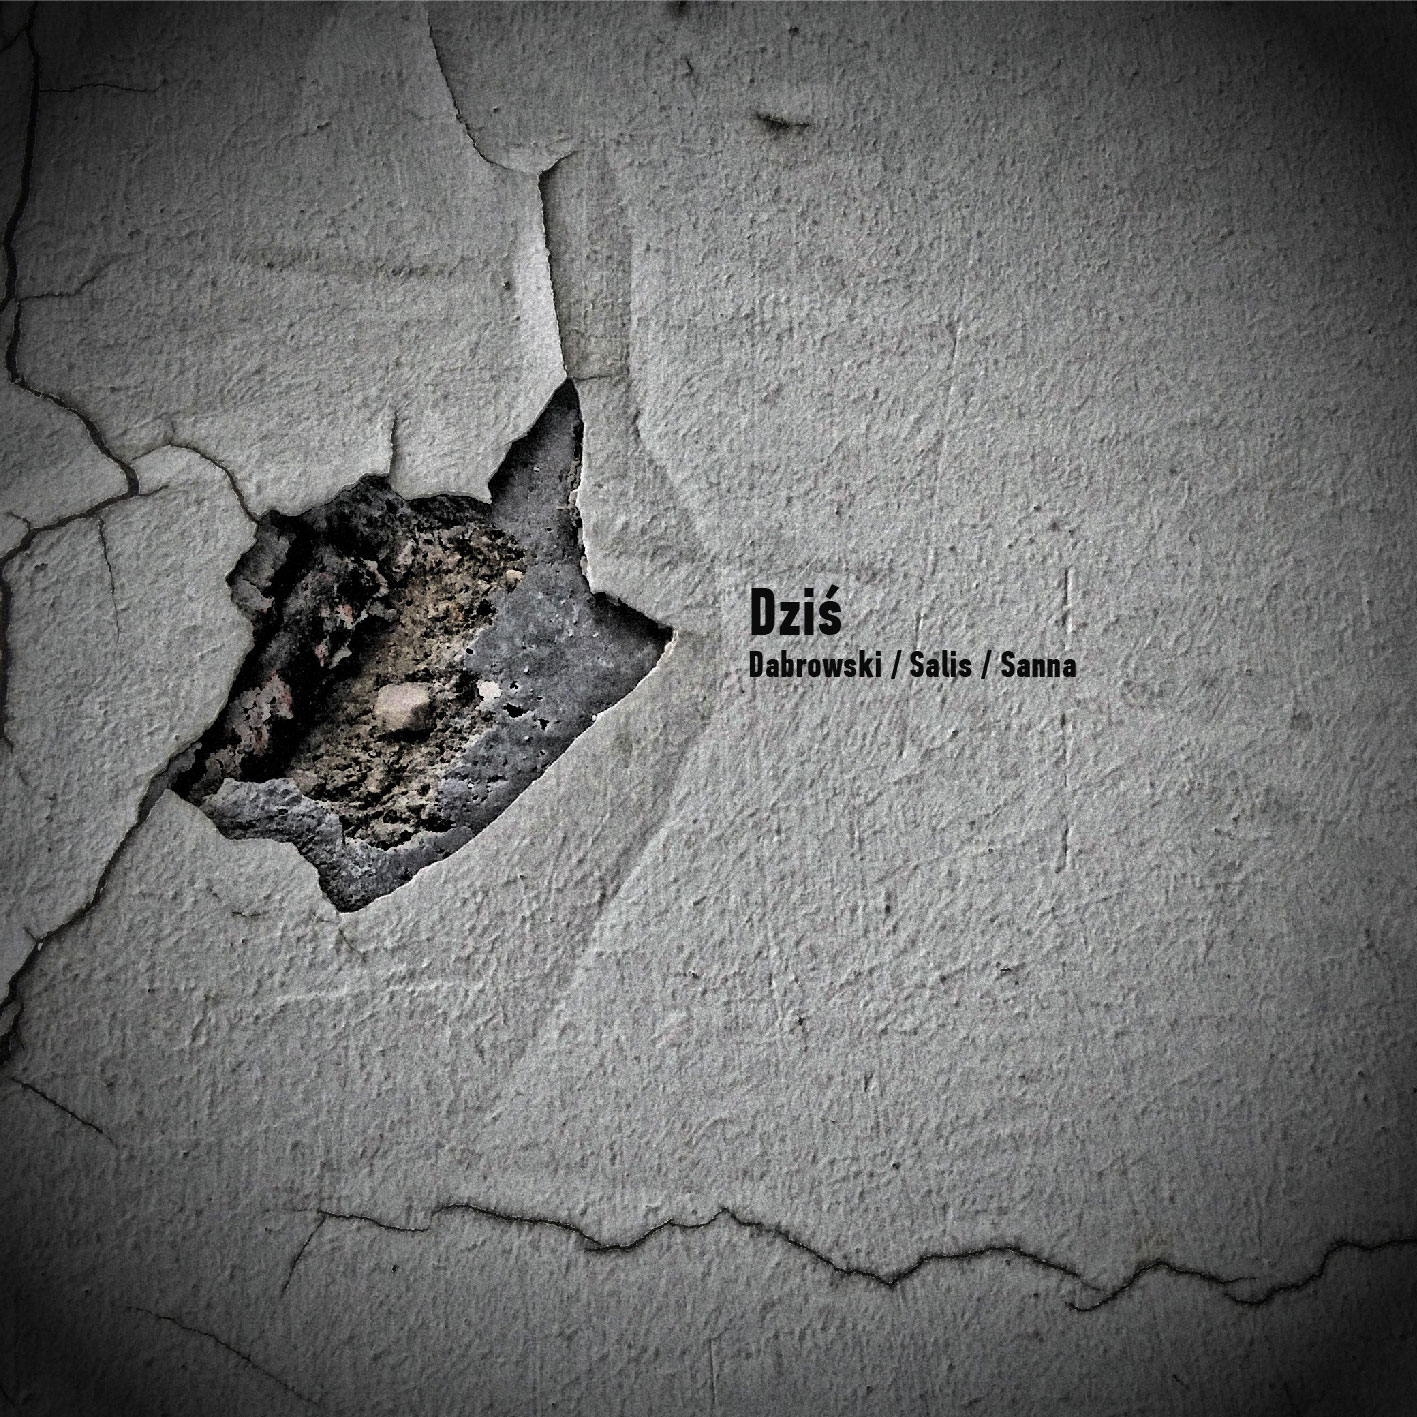 Dabrowski / Salis / Sanna – Dziś